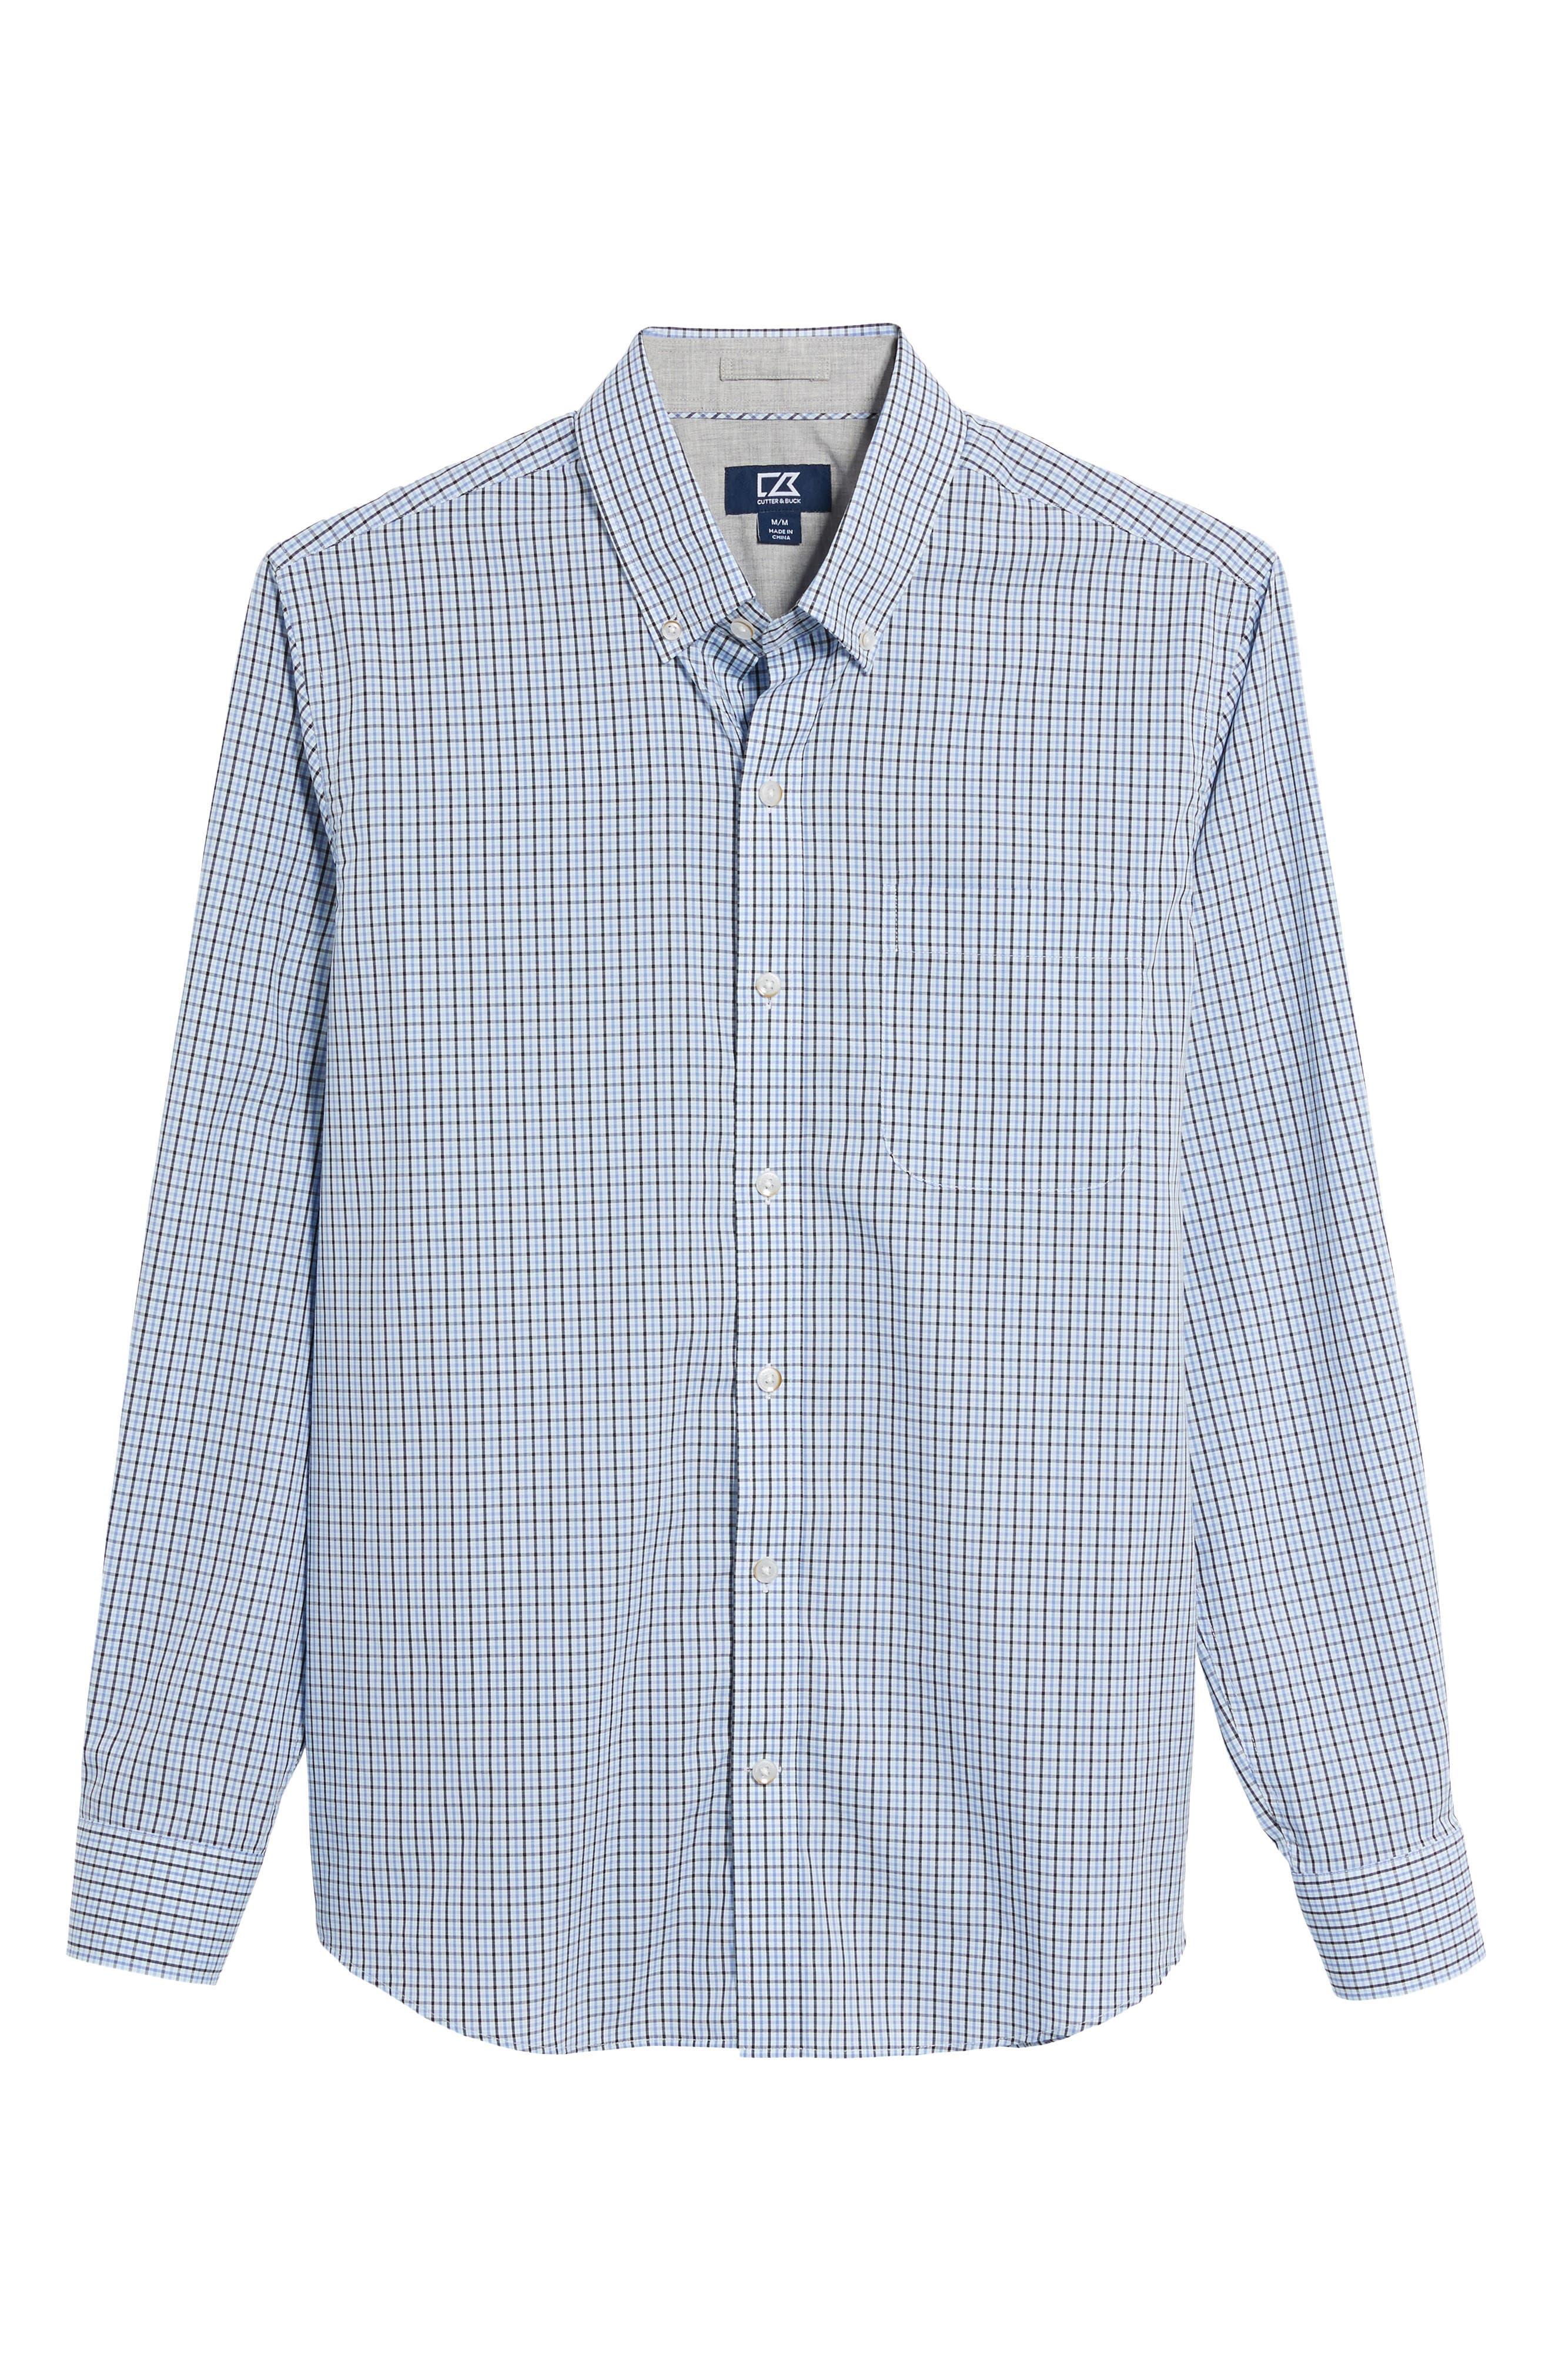 Easton Check Non-Iron Sport Shirt,                             Alternate thumbnail 6, color,                             Wisteria